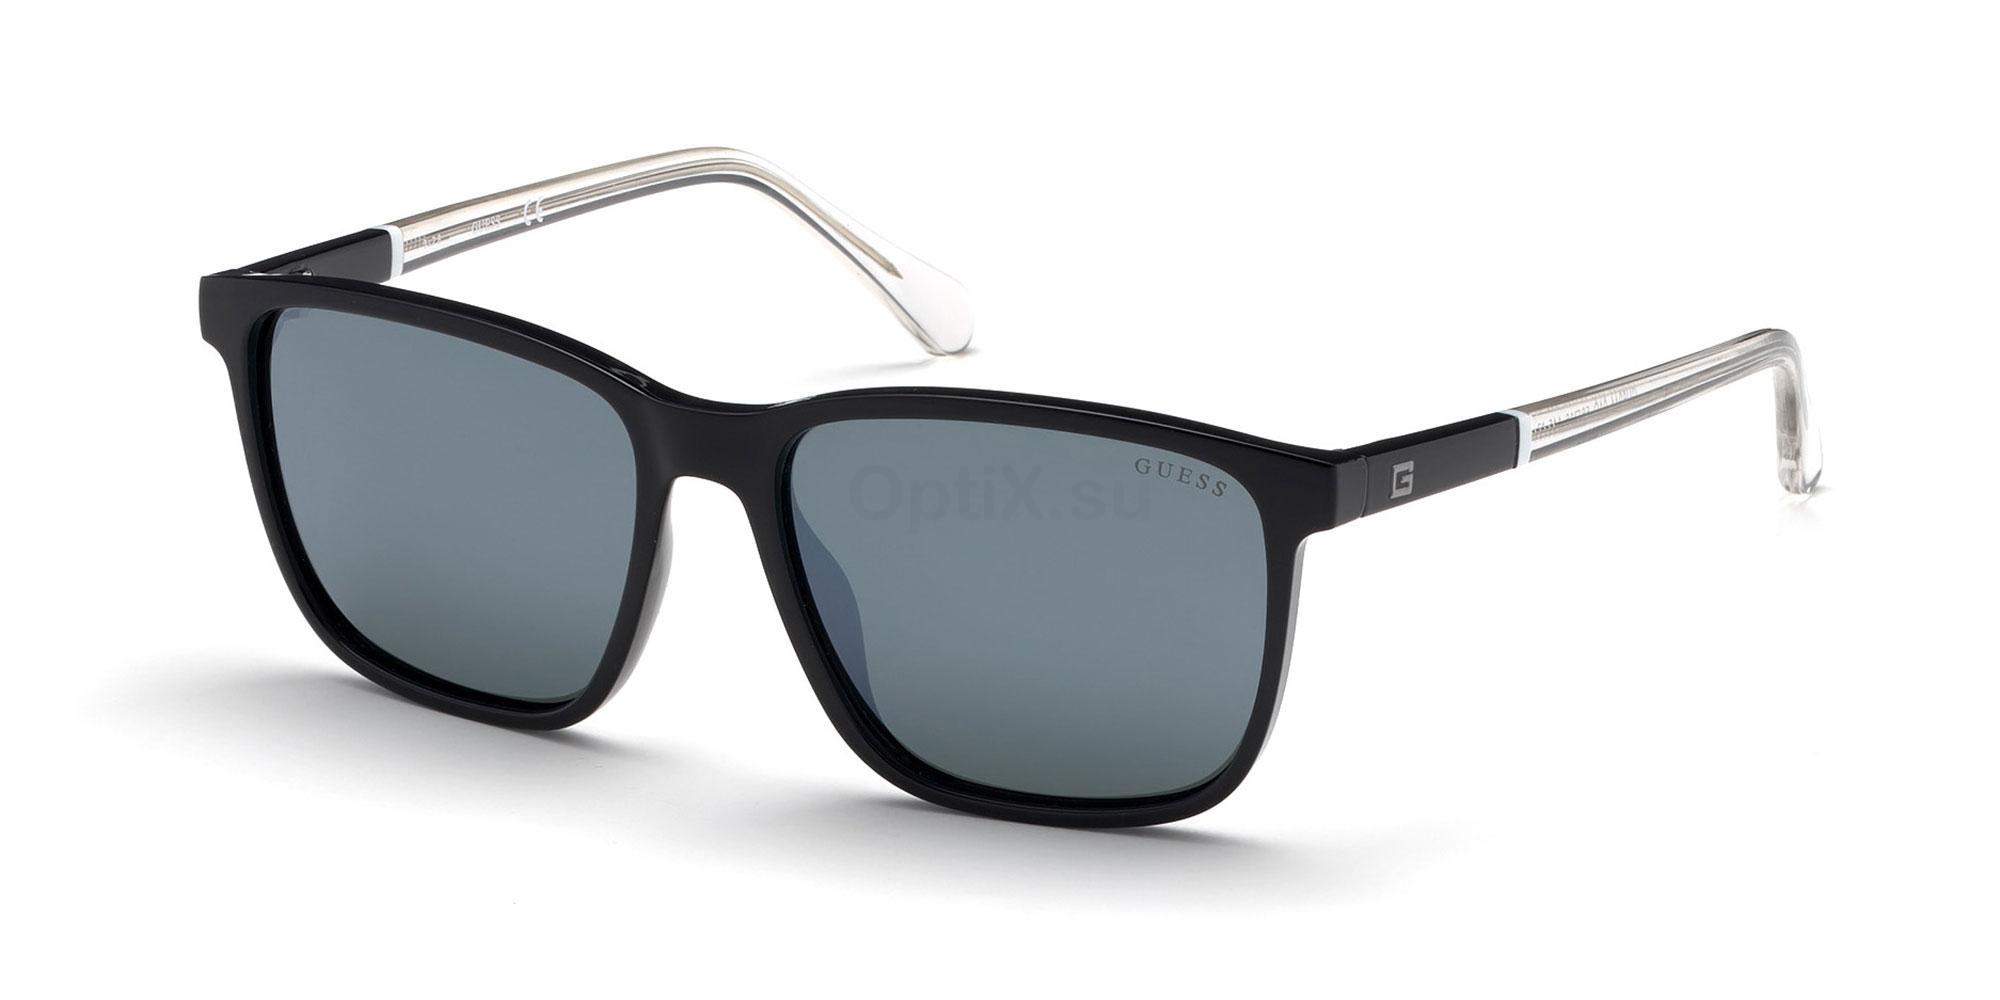 01Q GU6944 Sunglasses, Guess